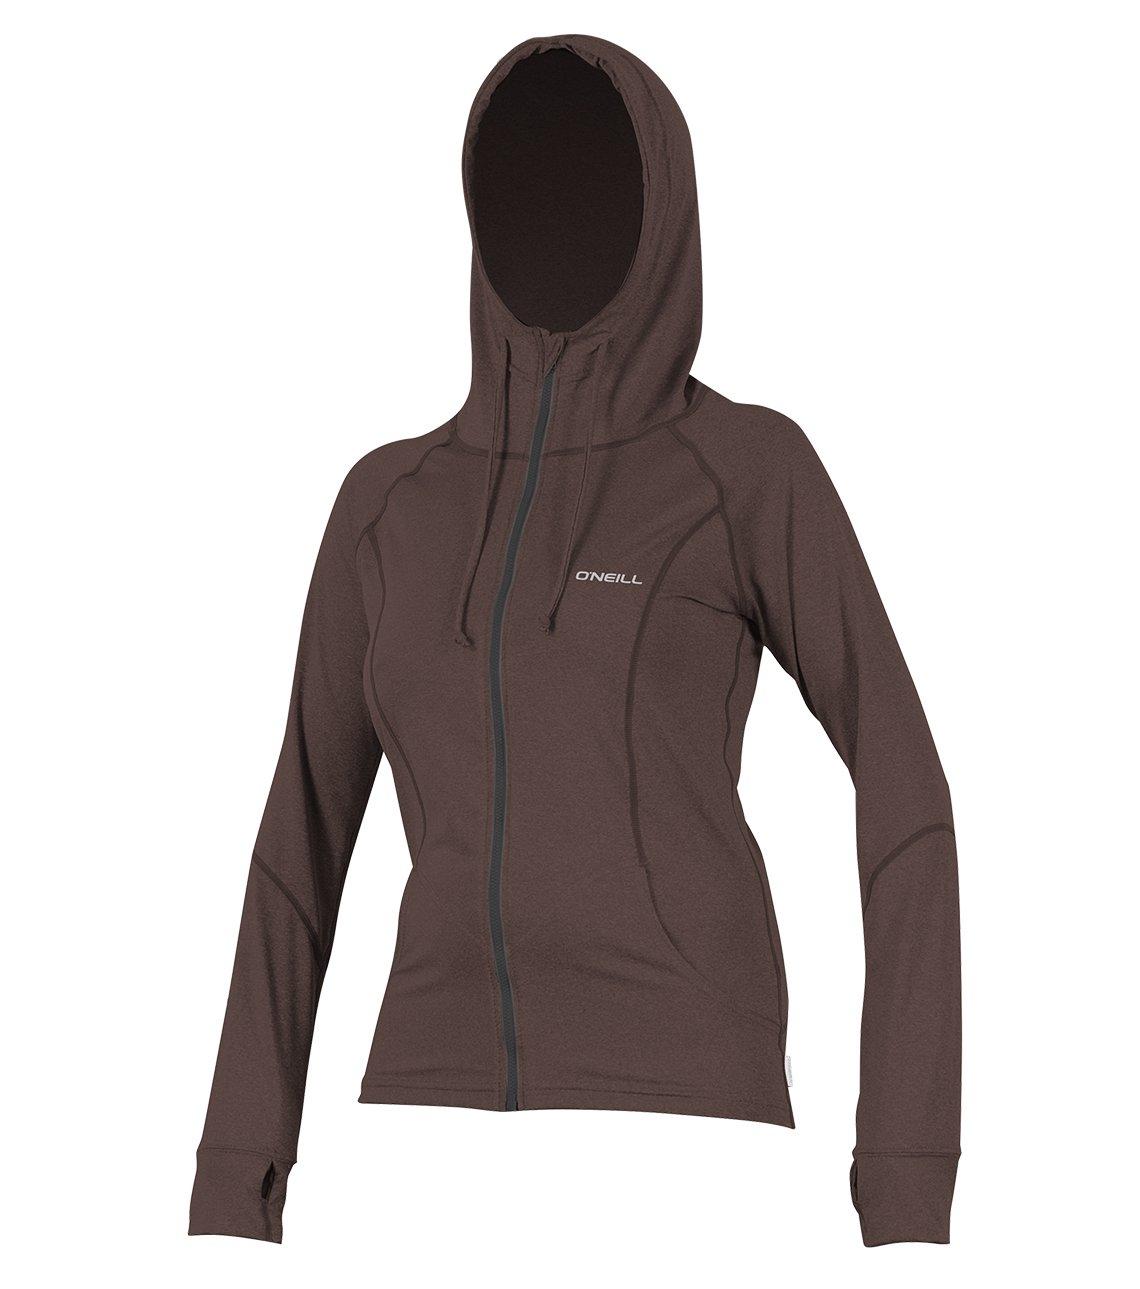 O'Neill Women's Hybrid UPF 50+ Long Sleeve Full Zip Sun Hoodie, Pepper, Small